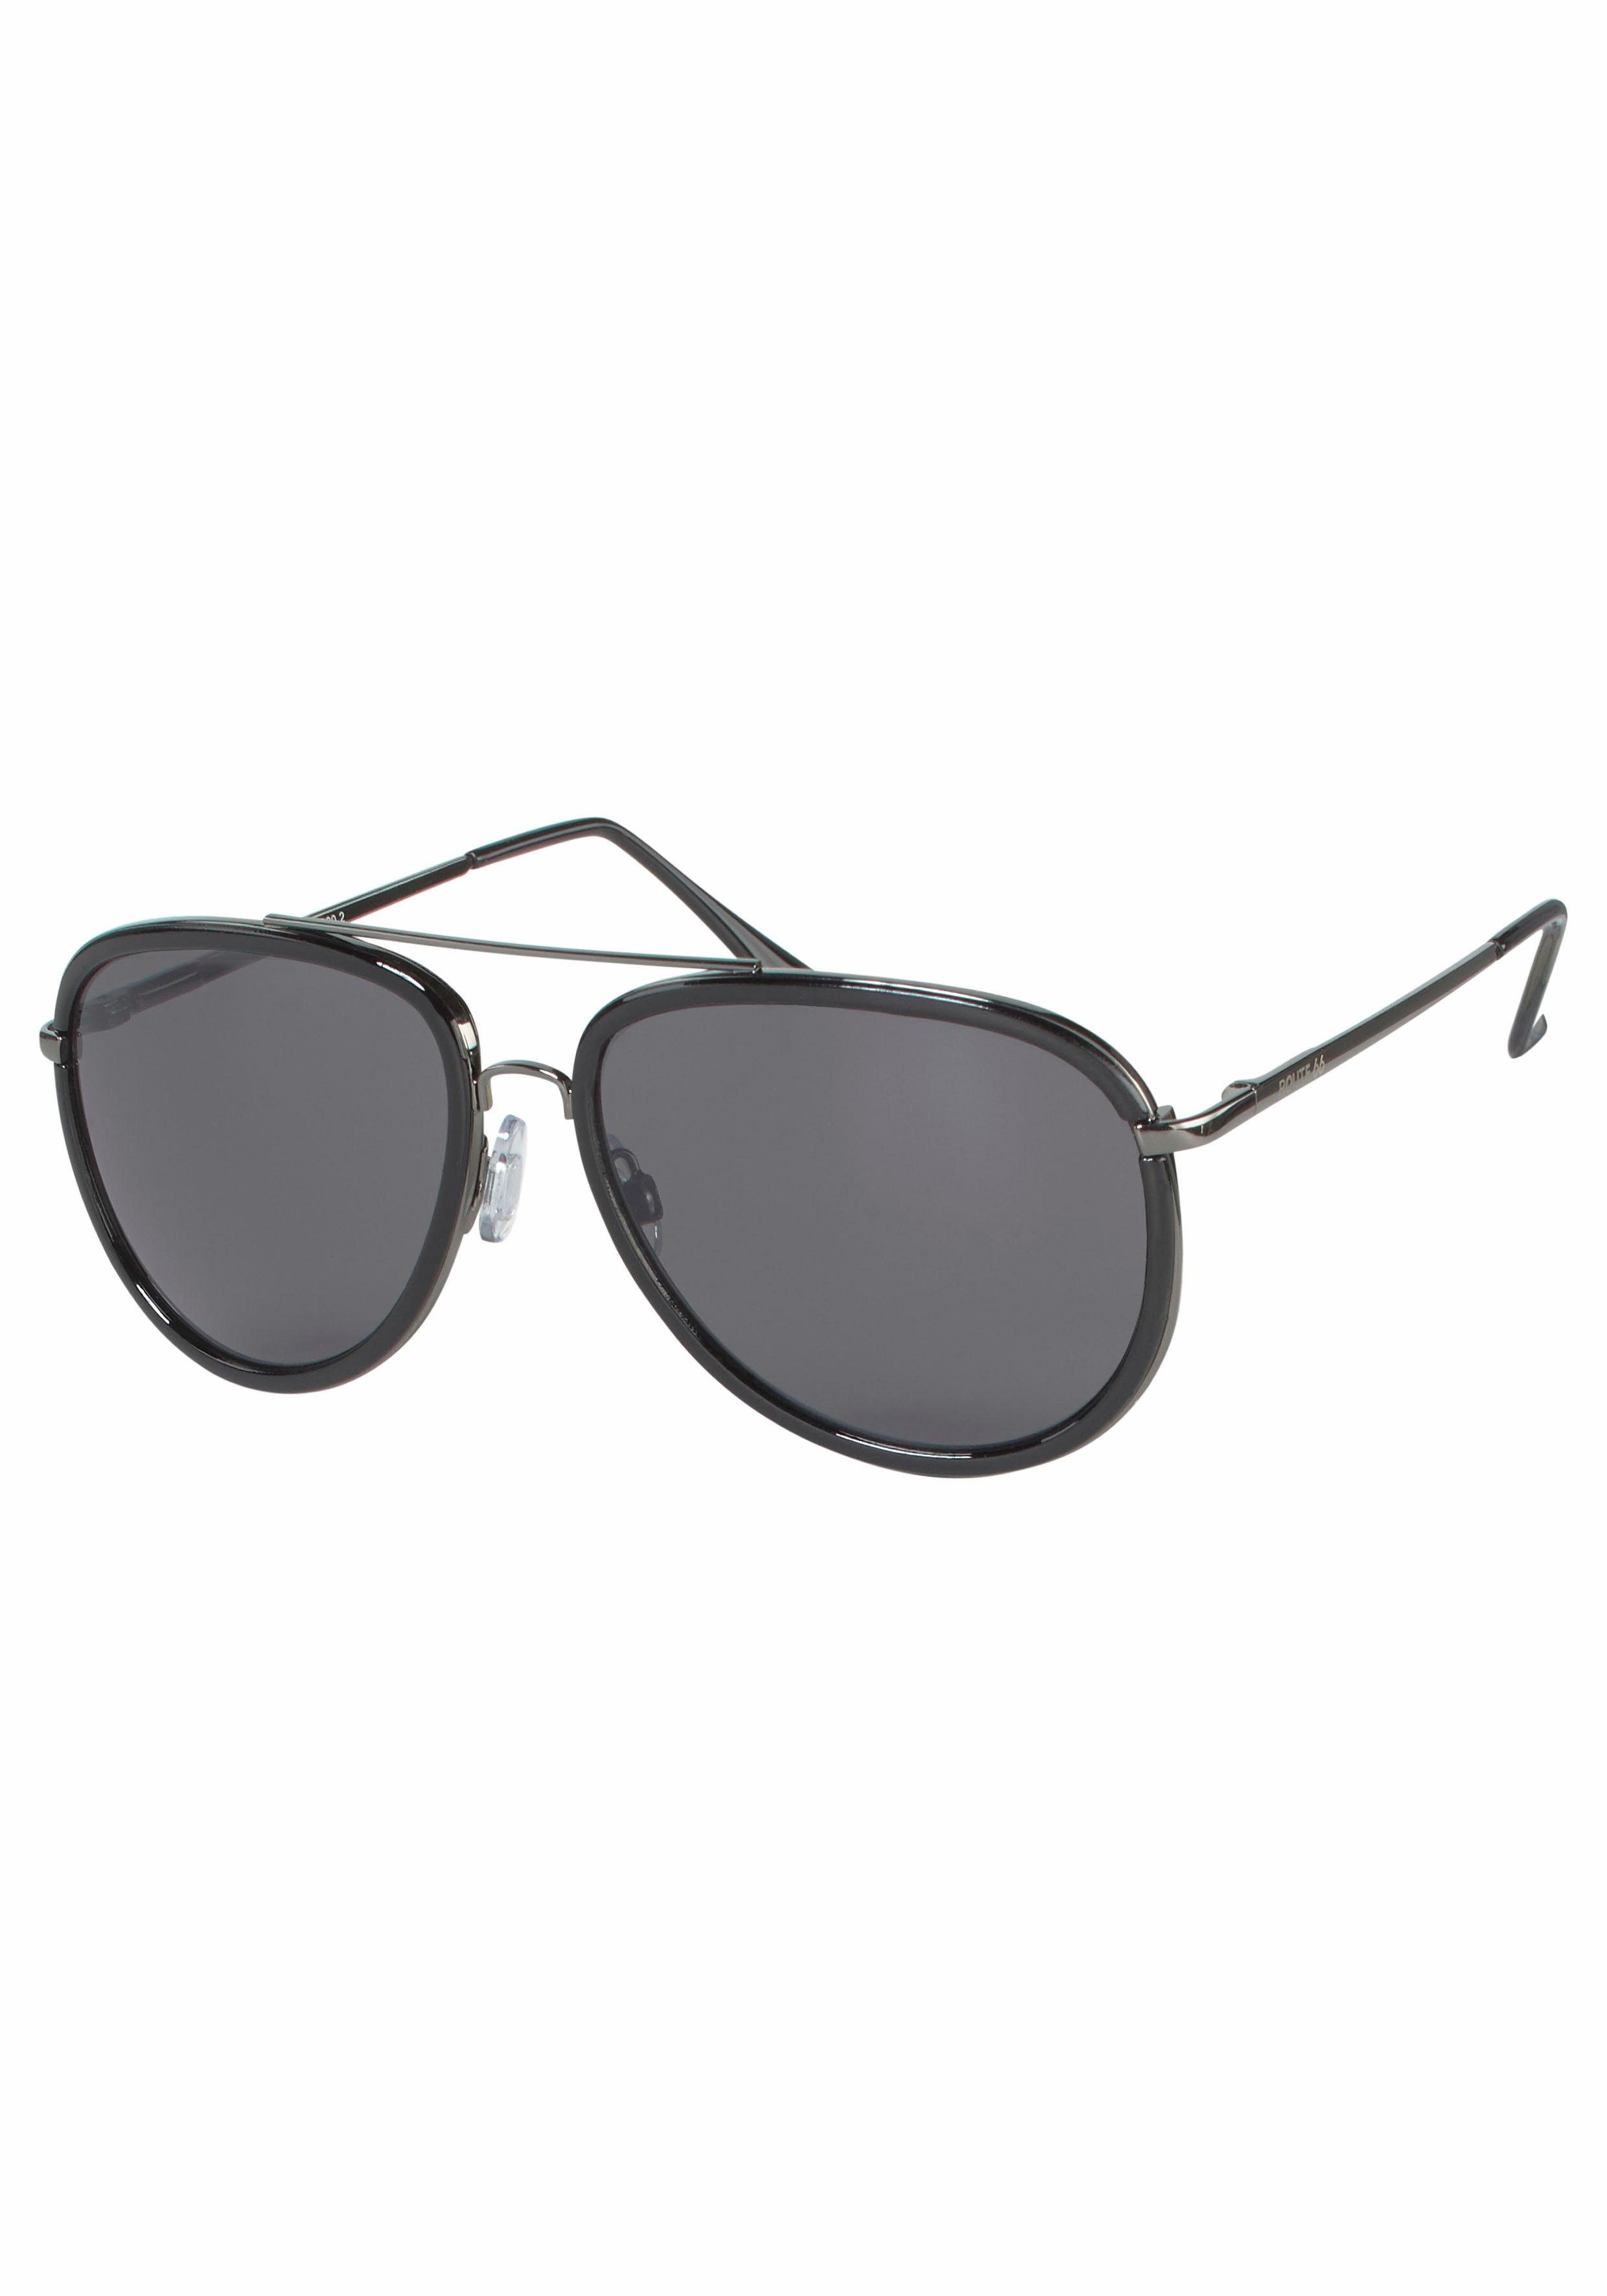 Route 66 Sonnenbrille im Materialmix